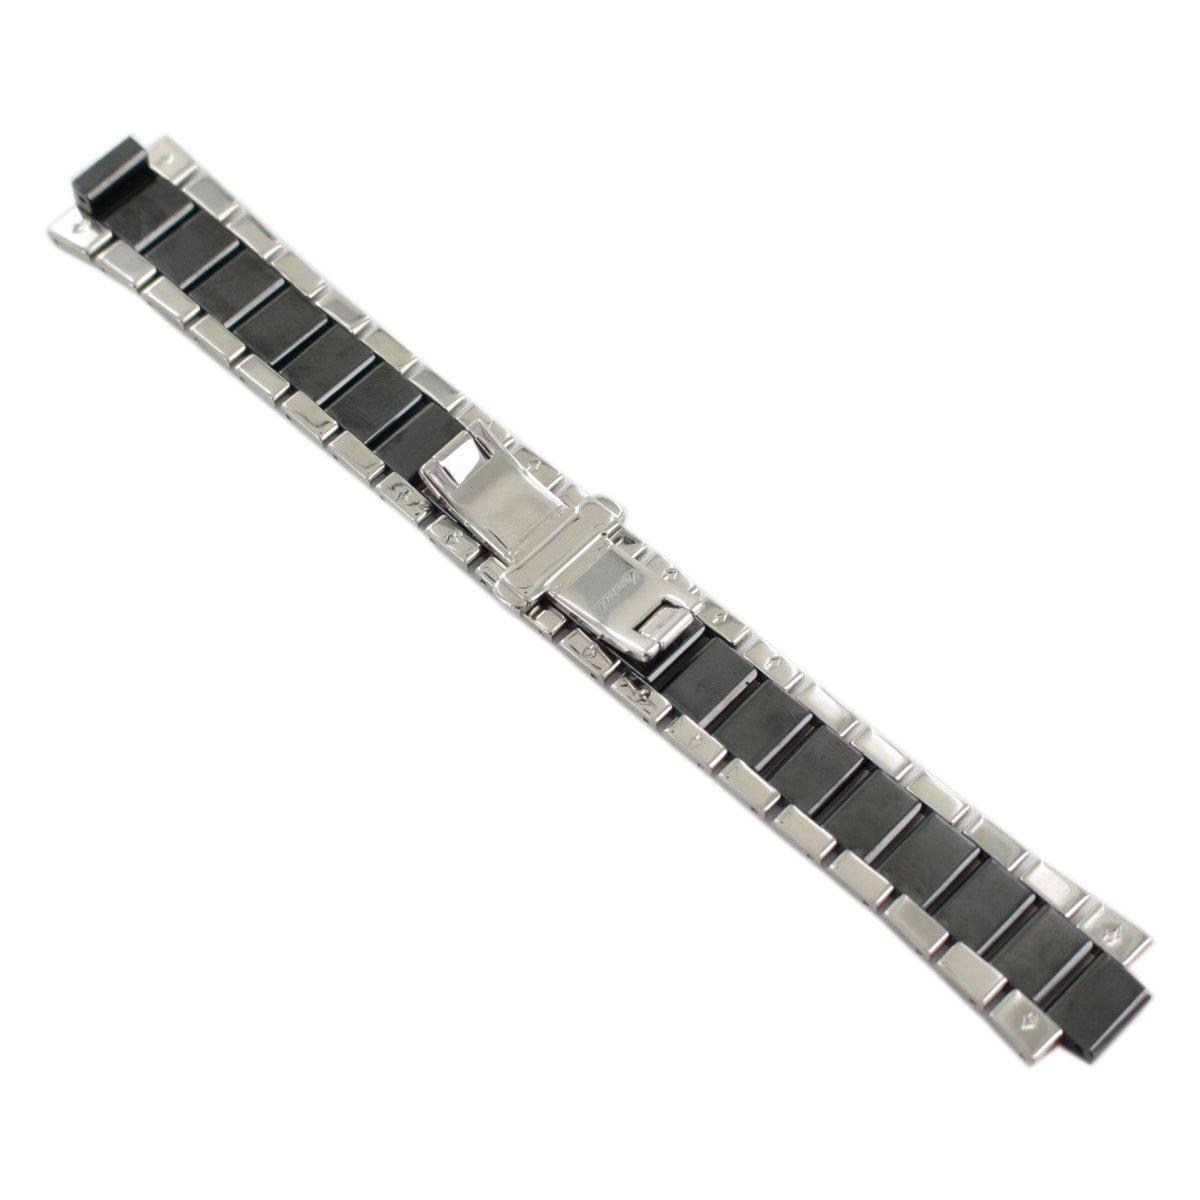 18mm Uhrenarmband Faltschließe BRAUN S-W